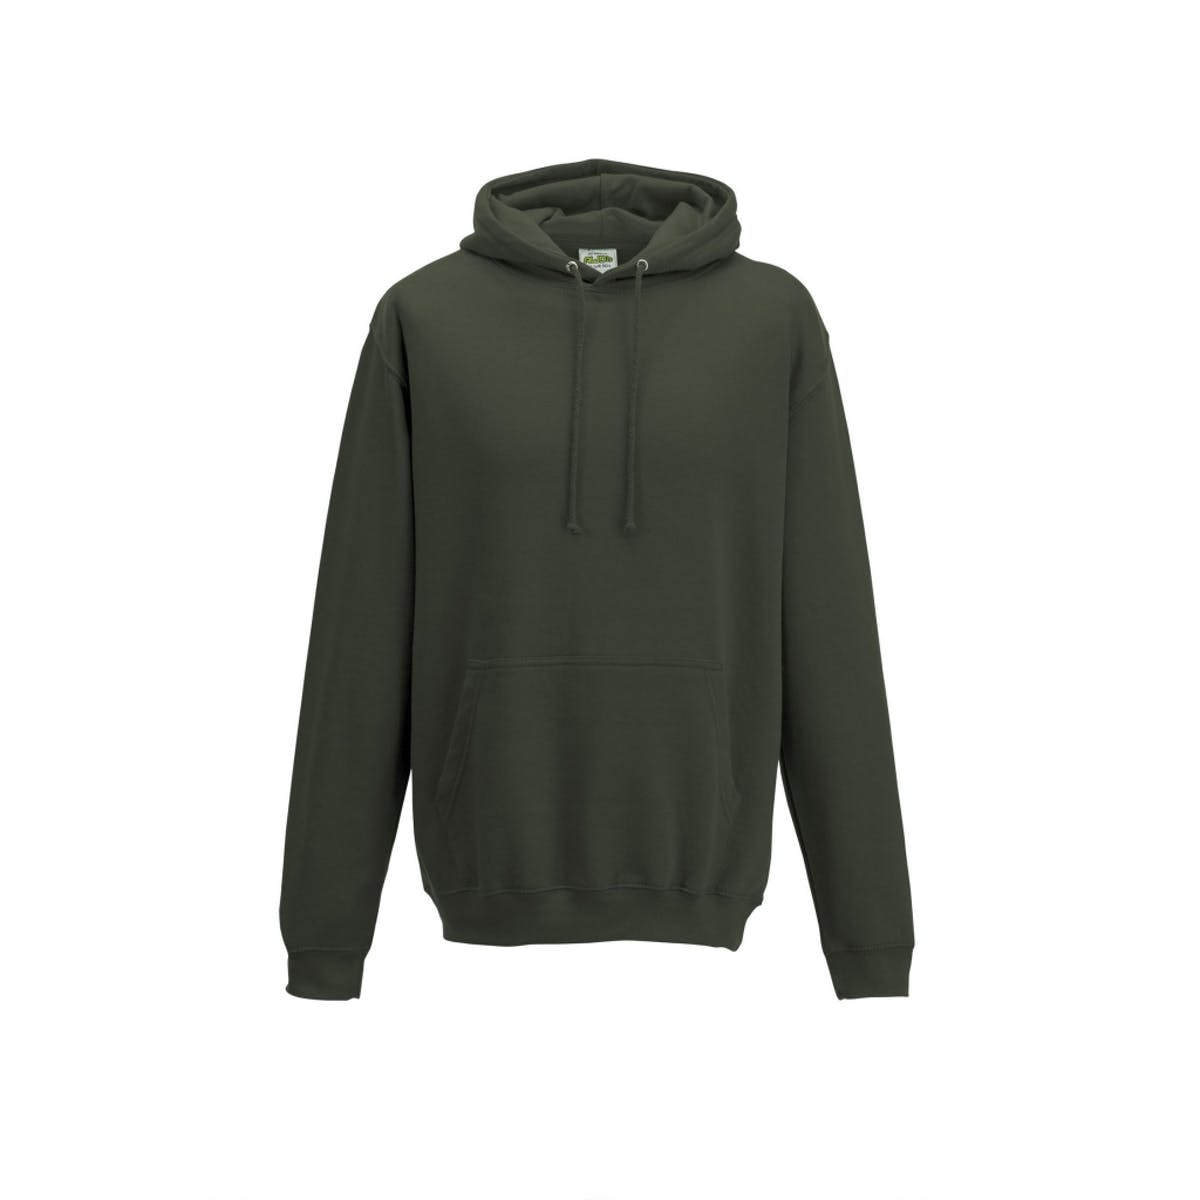 olive green college hoodies